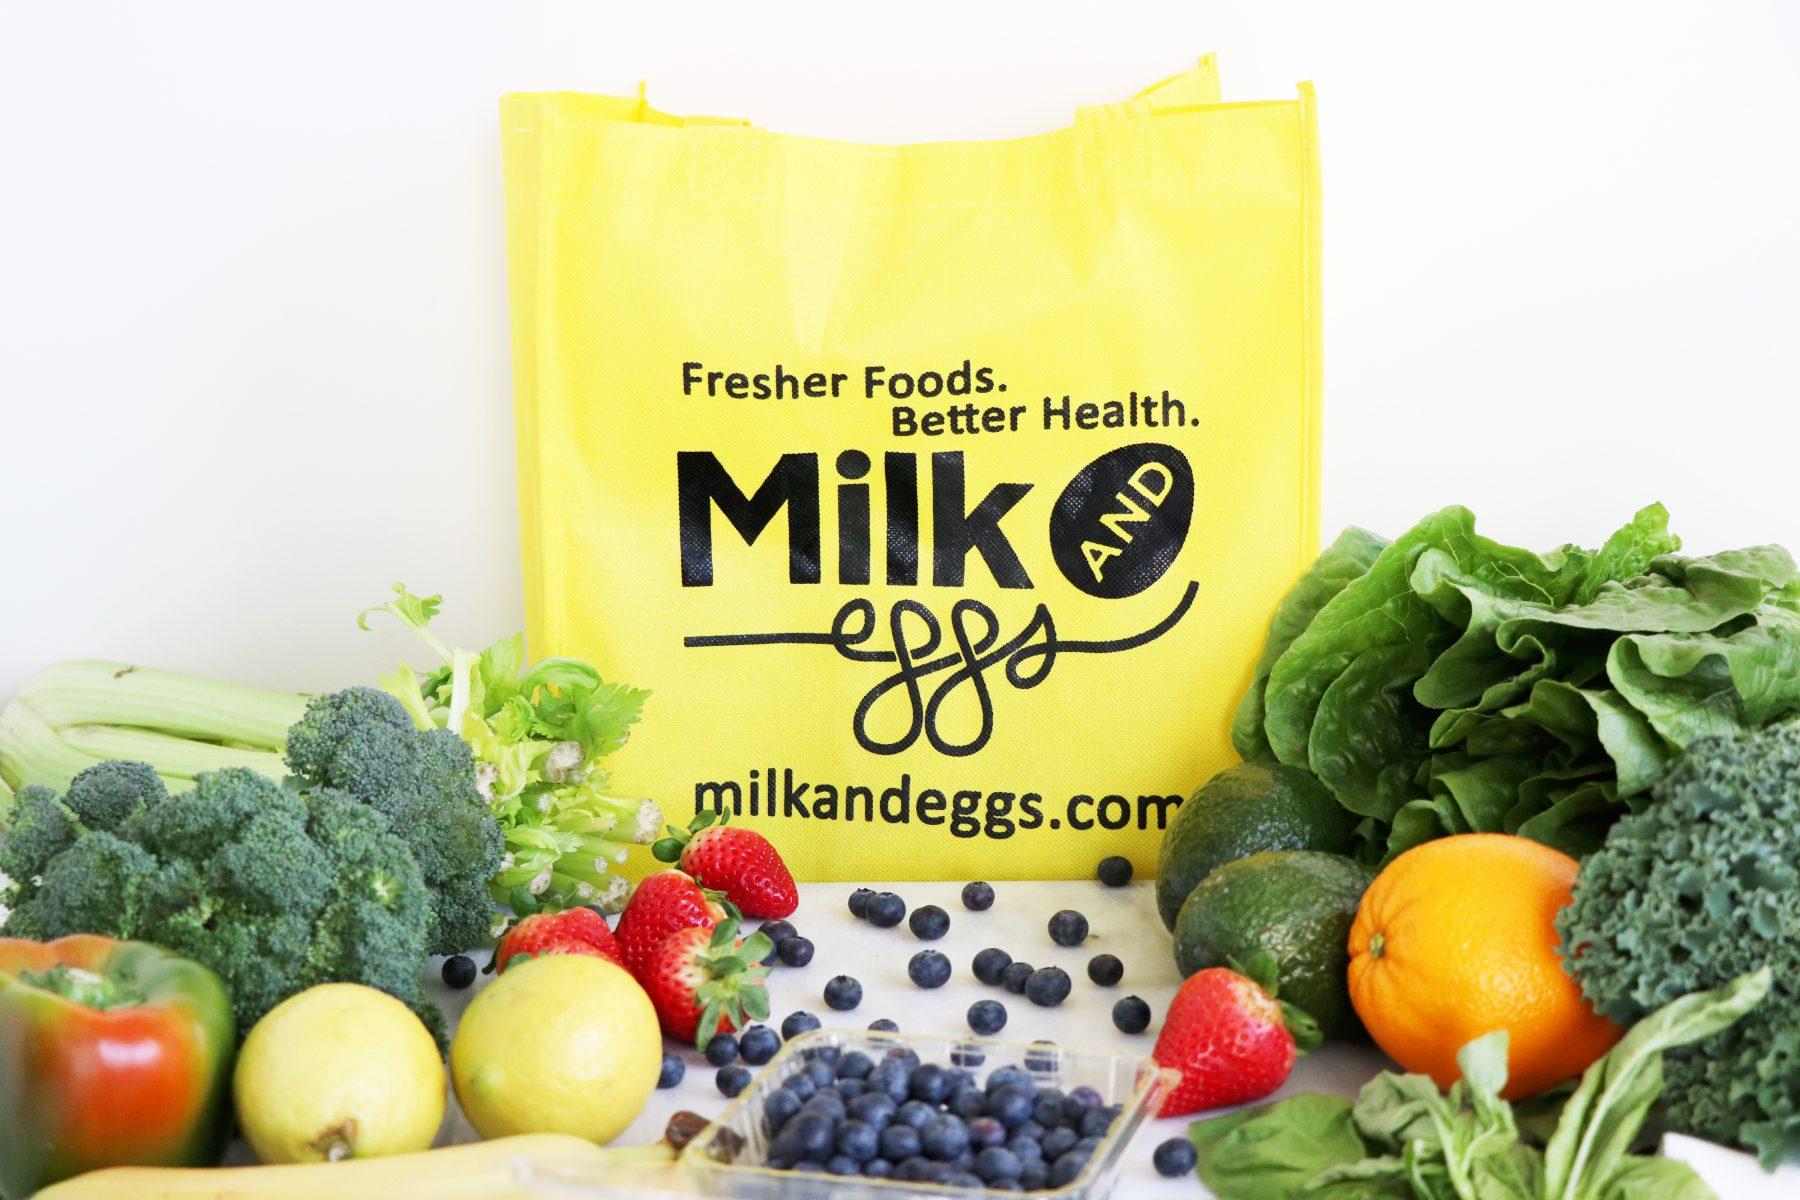 milk and eggs logo1.jpg